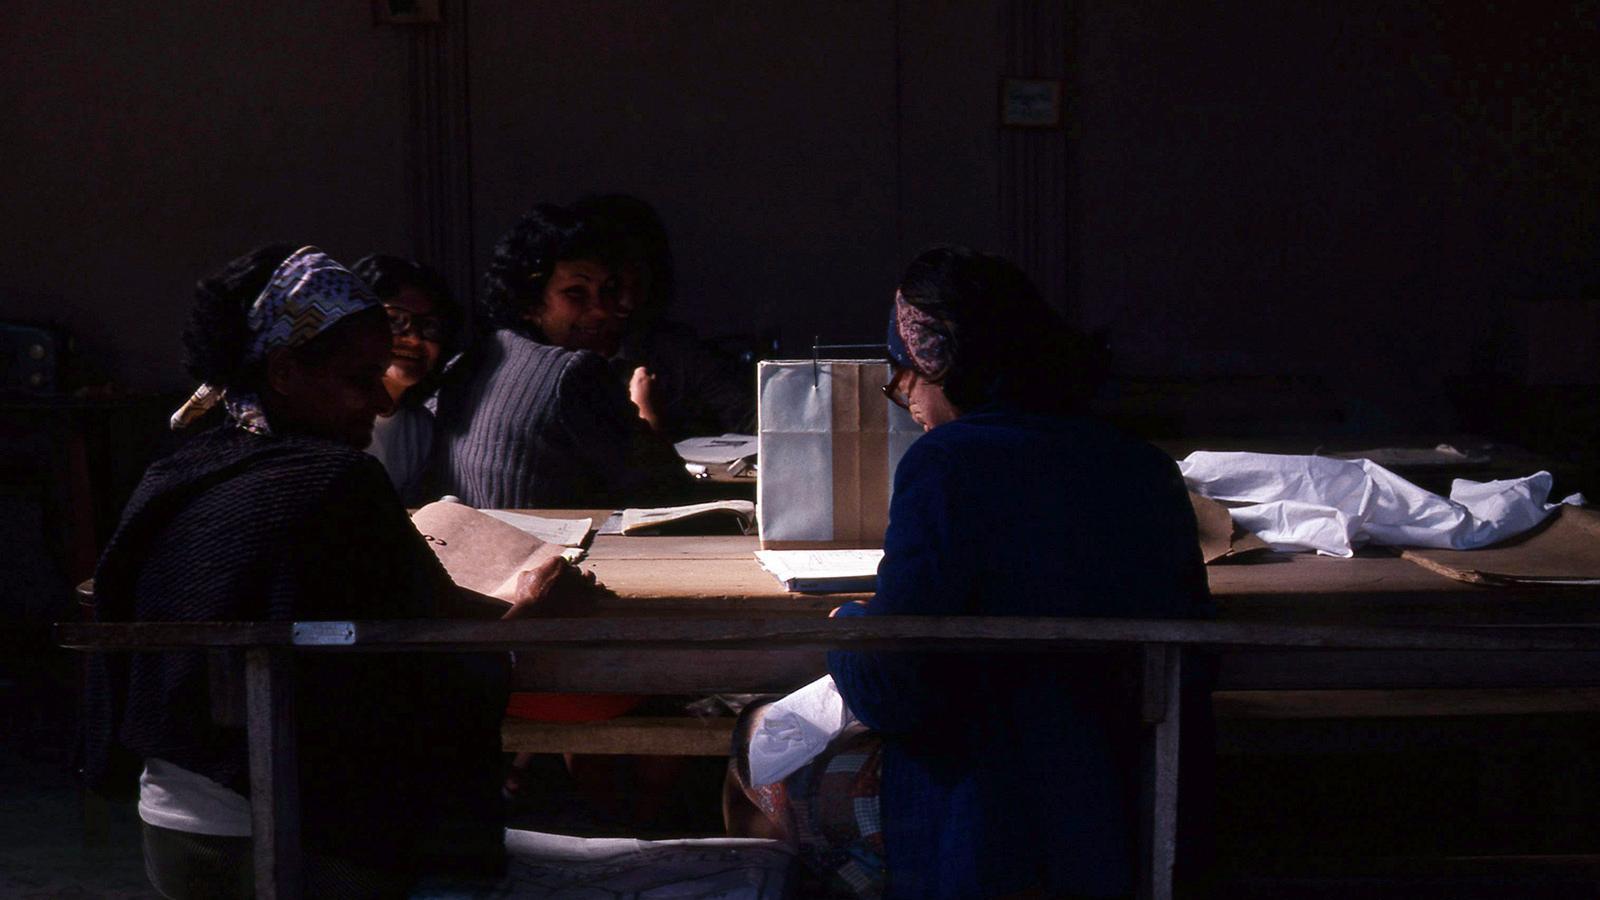 Martha Rosler, Workshop (de «Cuba», January, 1981) , 1981. Digital C-print, 27,9 x 41,3 cm. © Cortesia de Martha Rosler, 2020